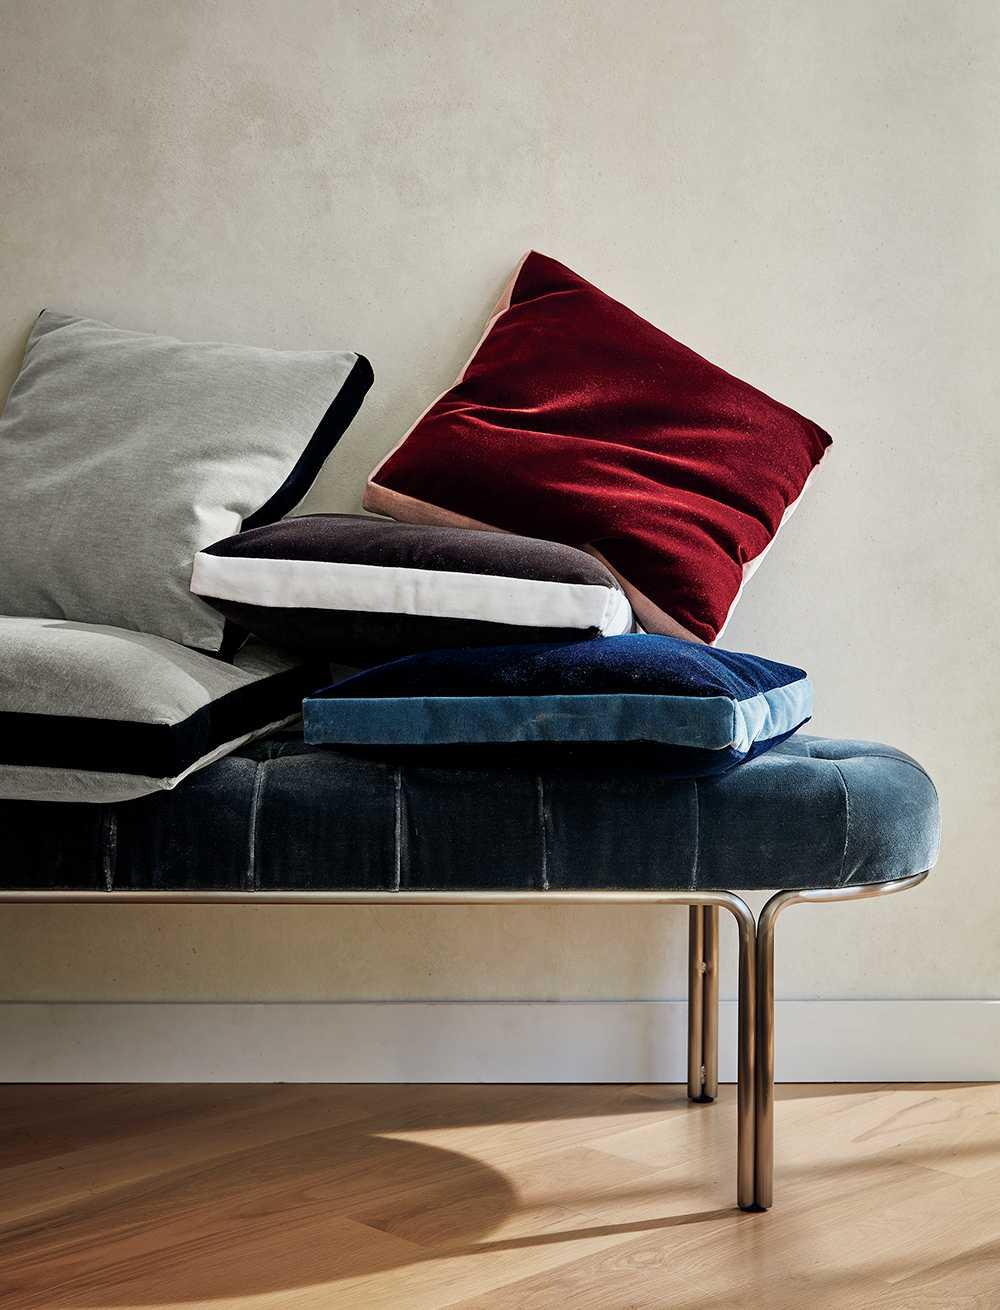 Modern Throw Pillows, Poufs & Decorative Throw Blankets | CB2